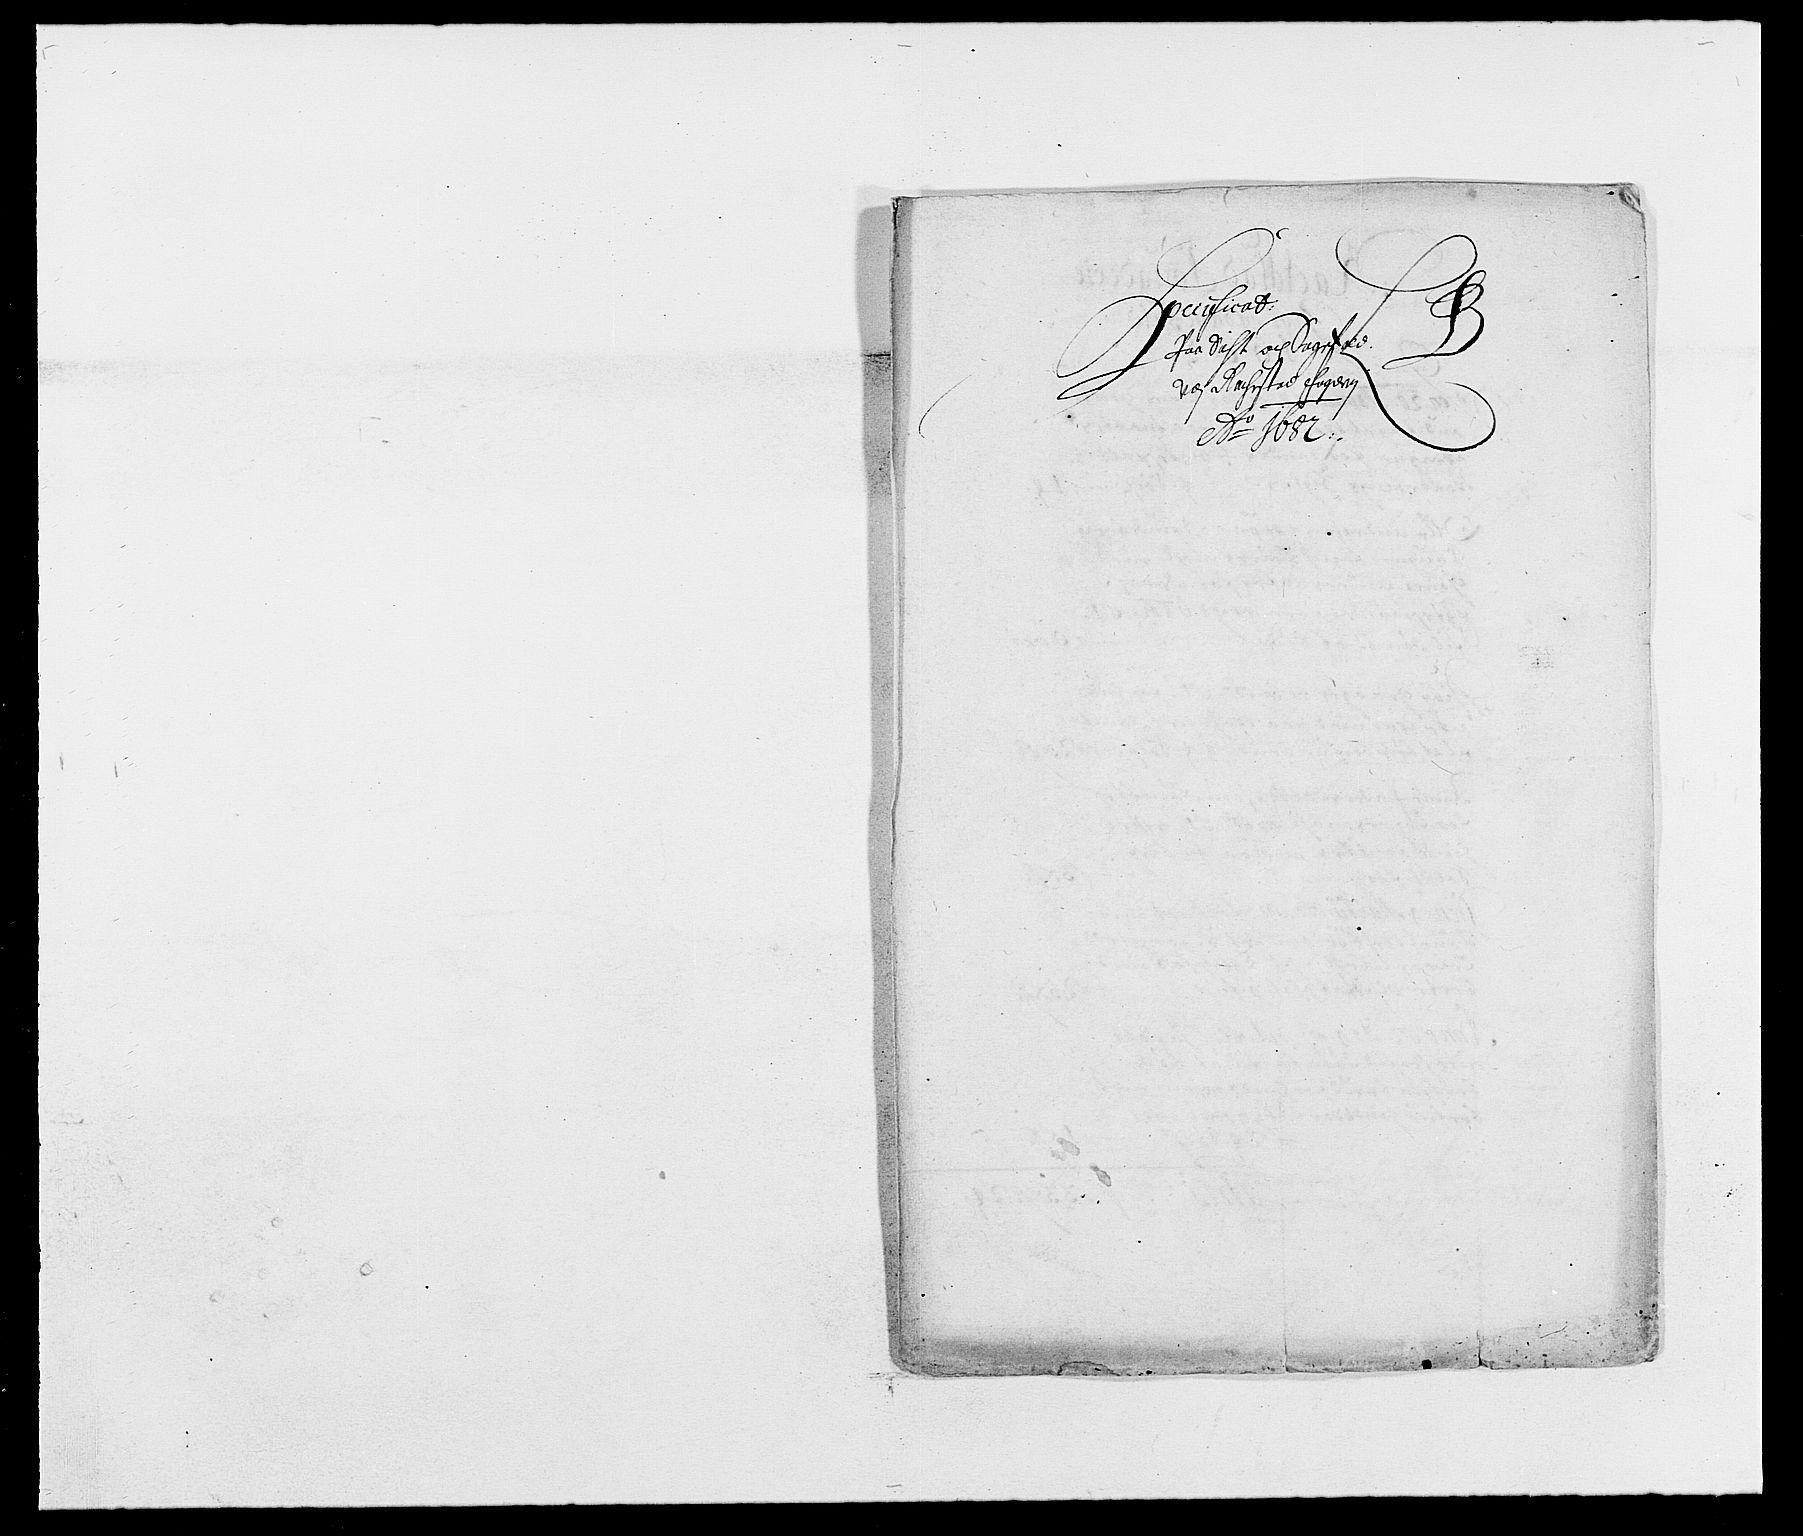 RA, Rentekammeret inntil 1814, Reviderte regnskaper, Fogderegnskap, R05/L0273: Fogderegnskap Rakkestad, 1682, s. 92